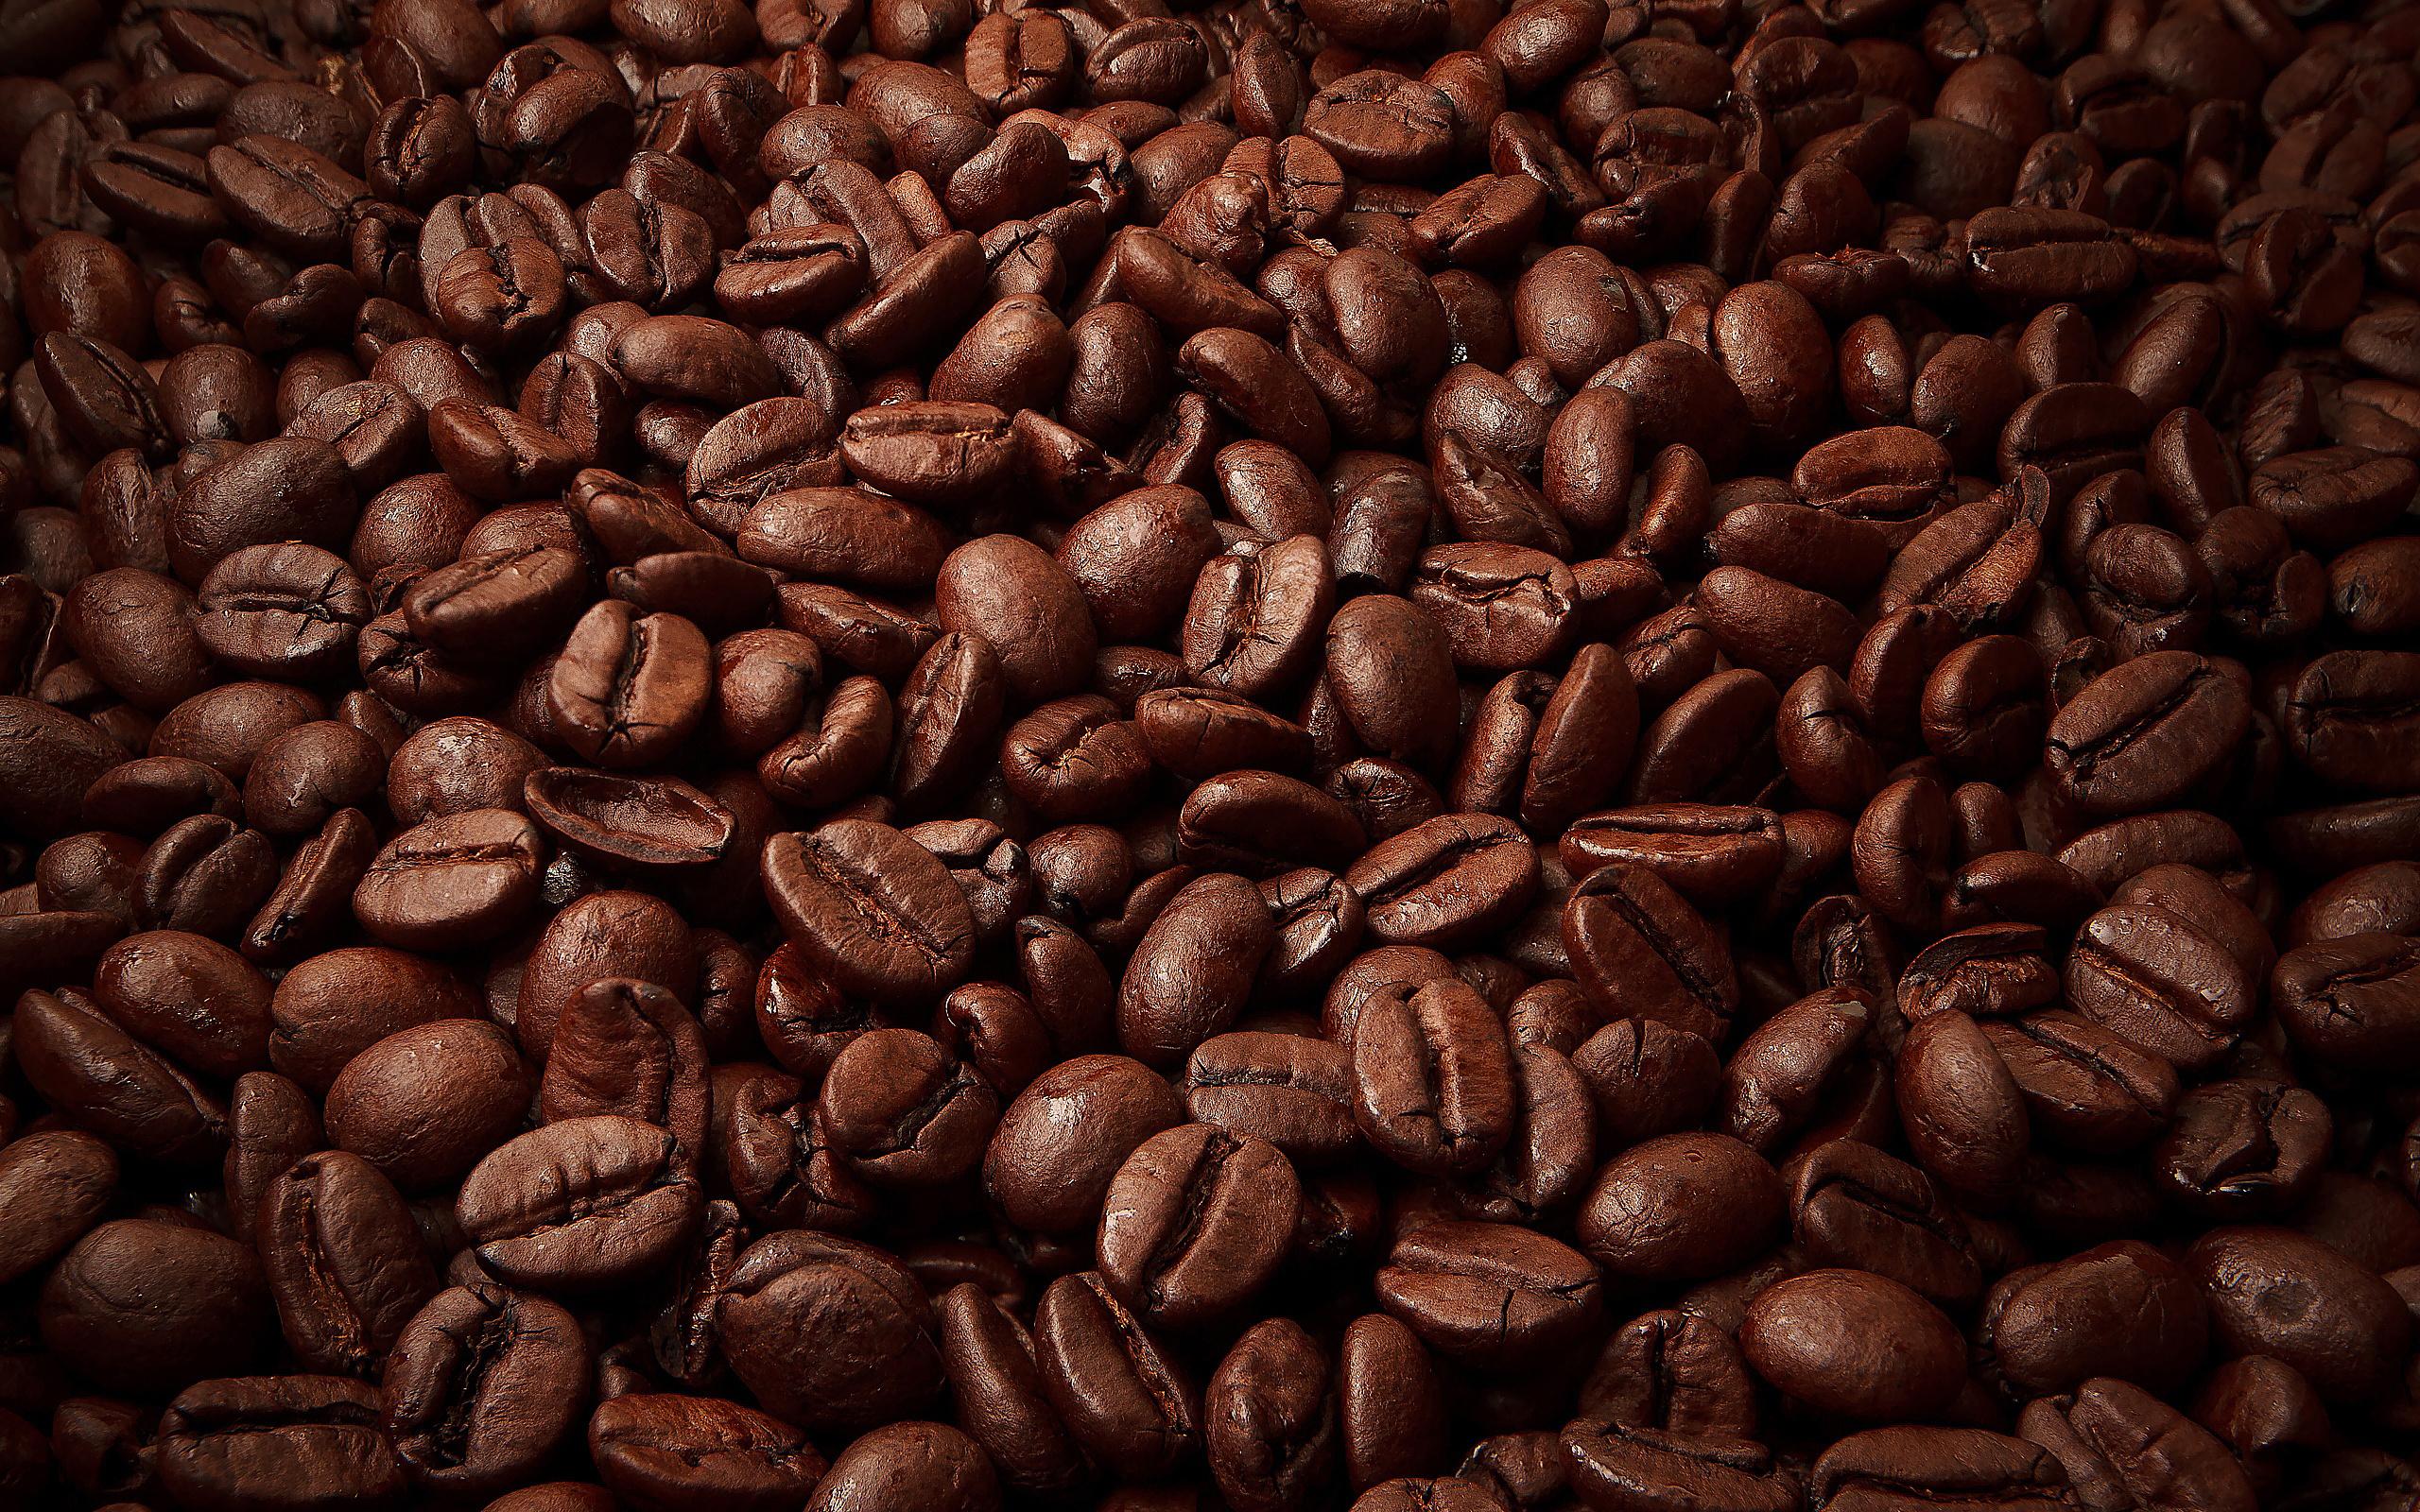 Coffee Computer Wallpapers, Desktop Backgrounds | 2560x1600 | ID .